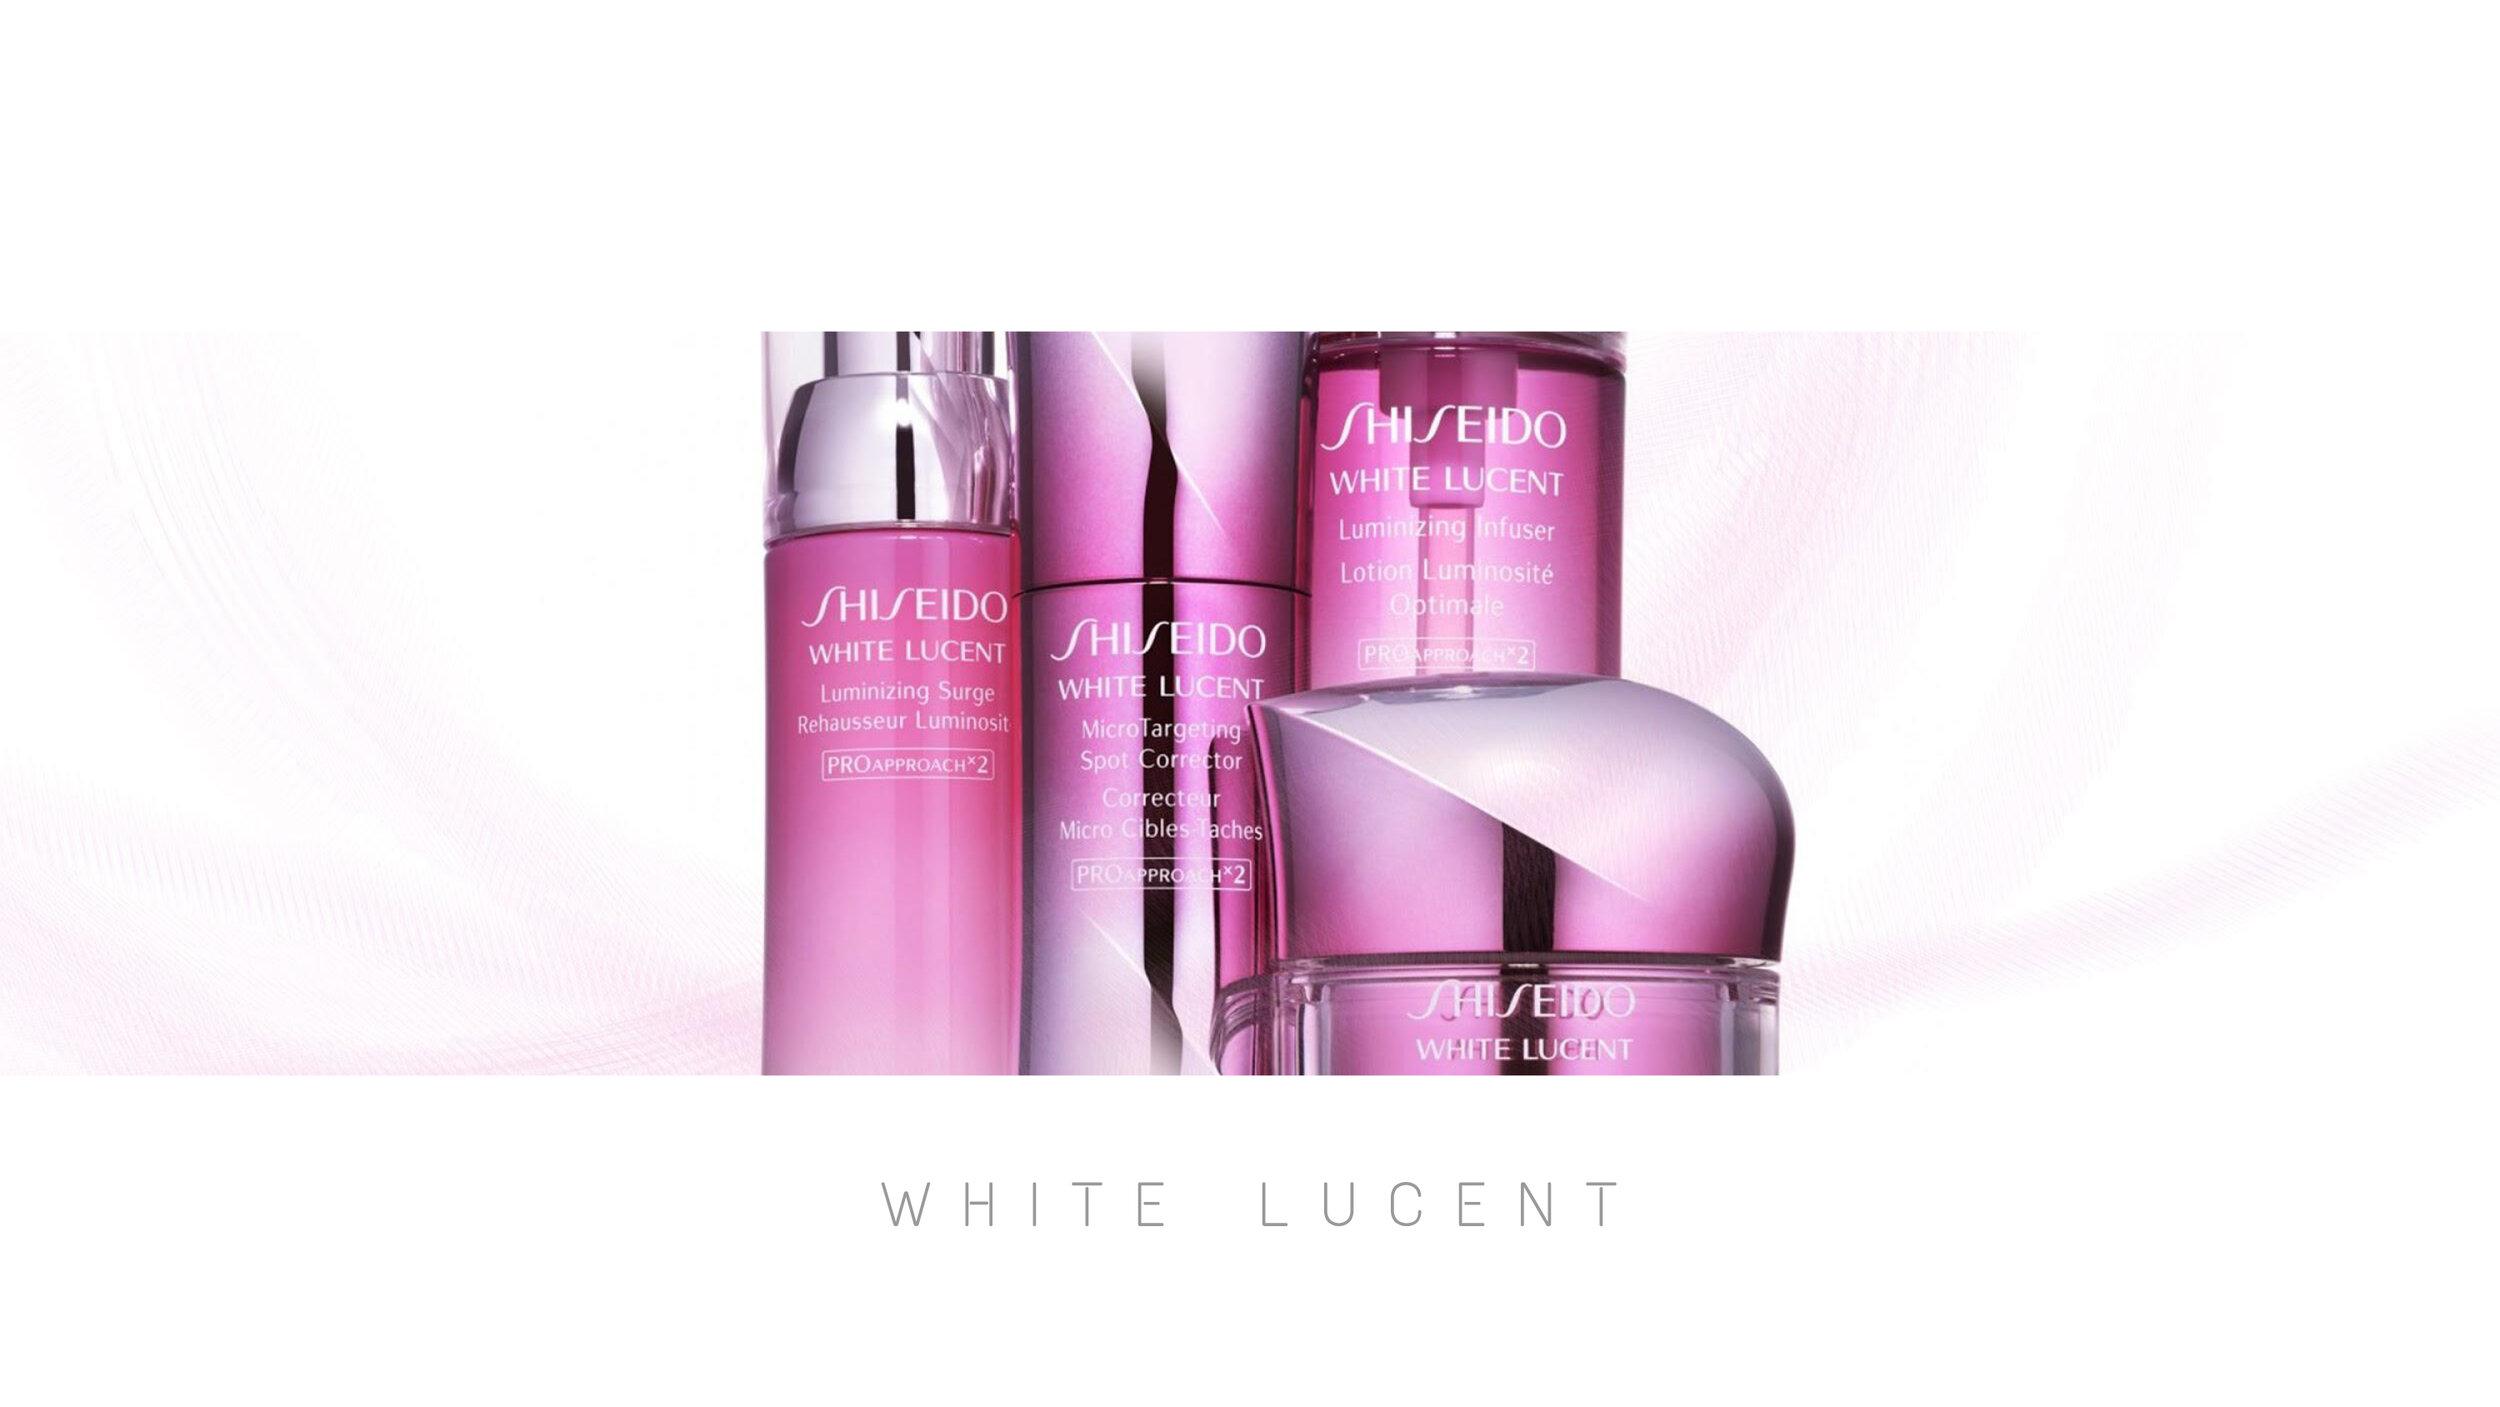 shiseido_brandbook_whitelucent1.jpg